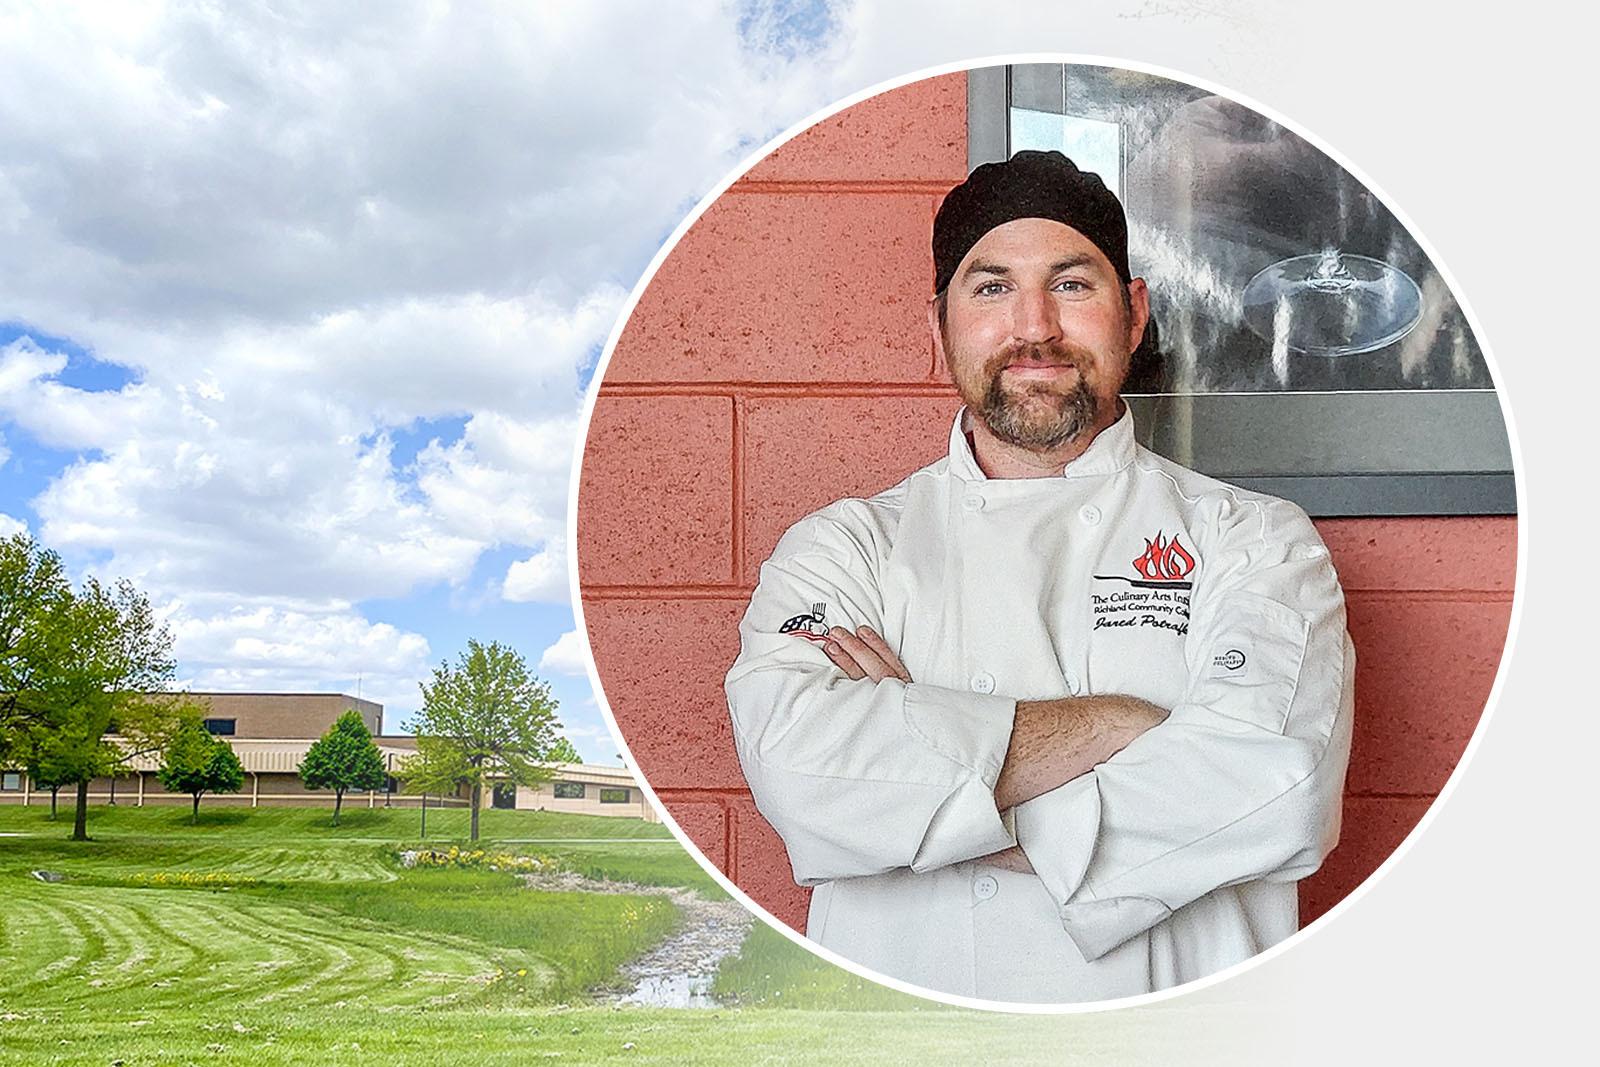 Richland's Culinary Arts program